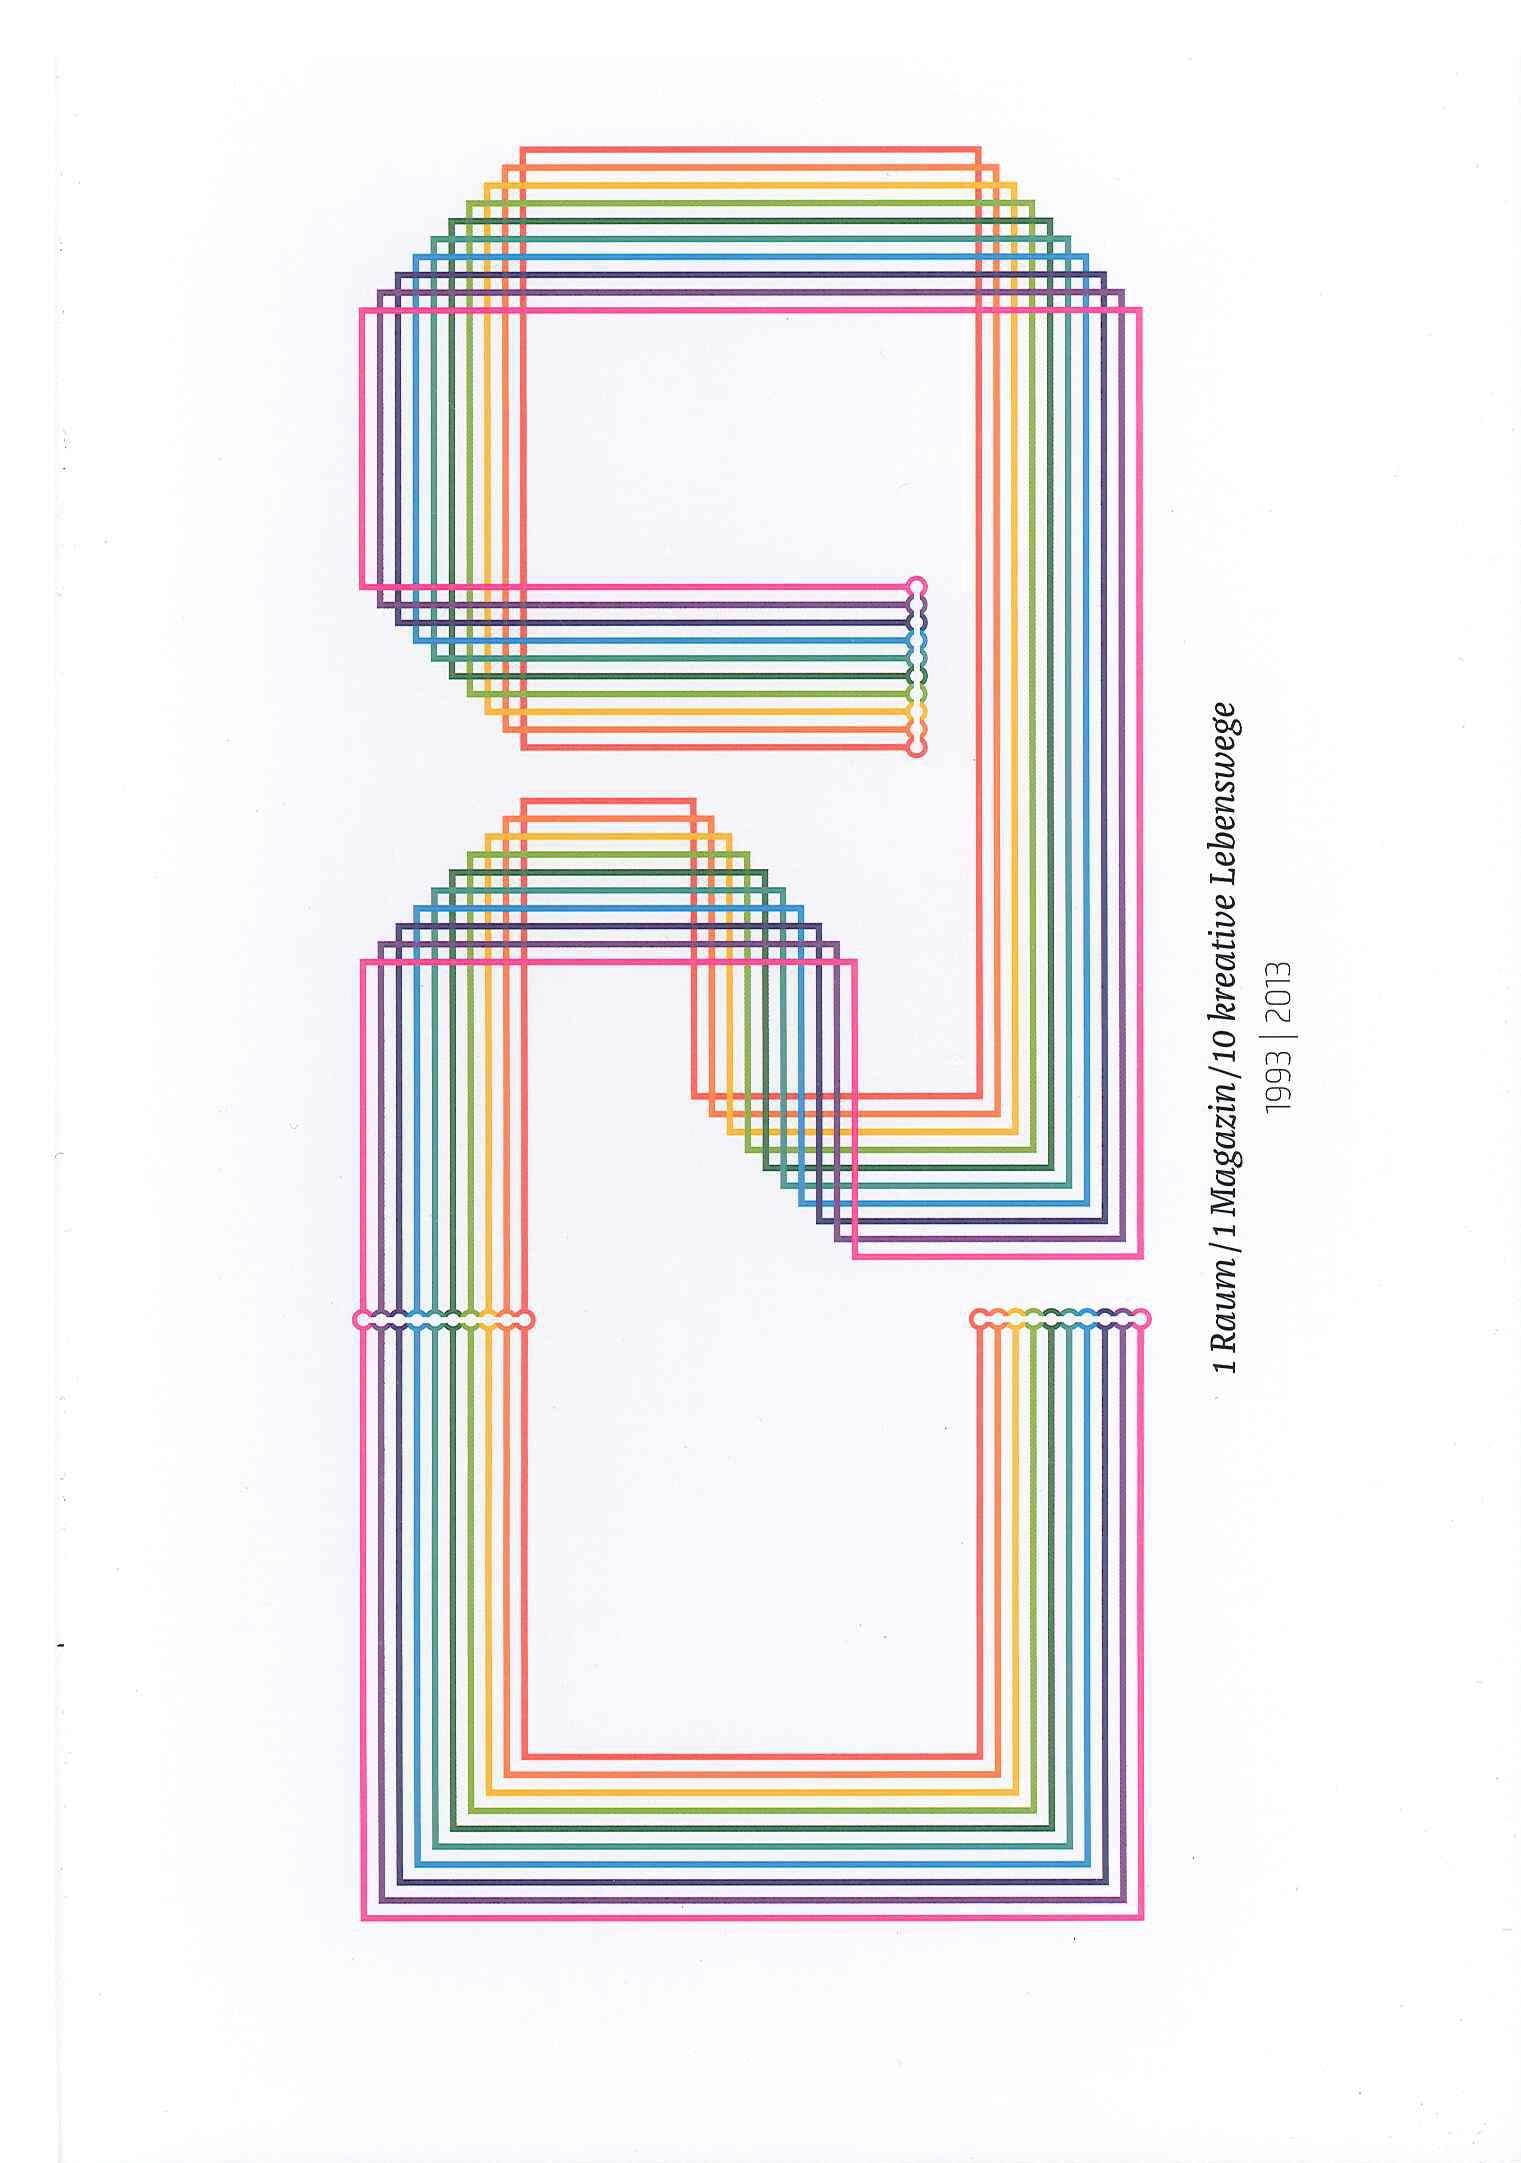 Mutabor- 1 Raum- 1 Magazin- 10 kreative Lebenswege